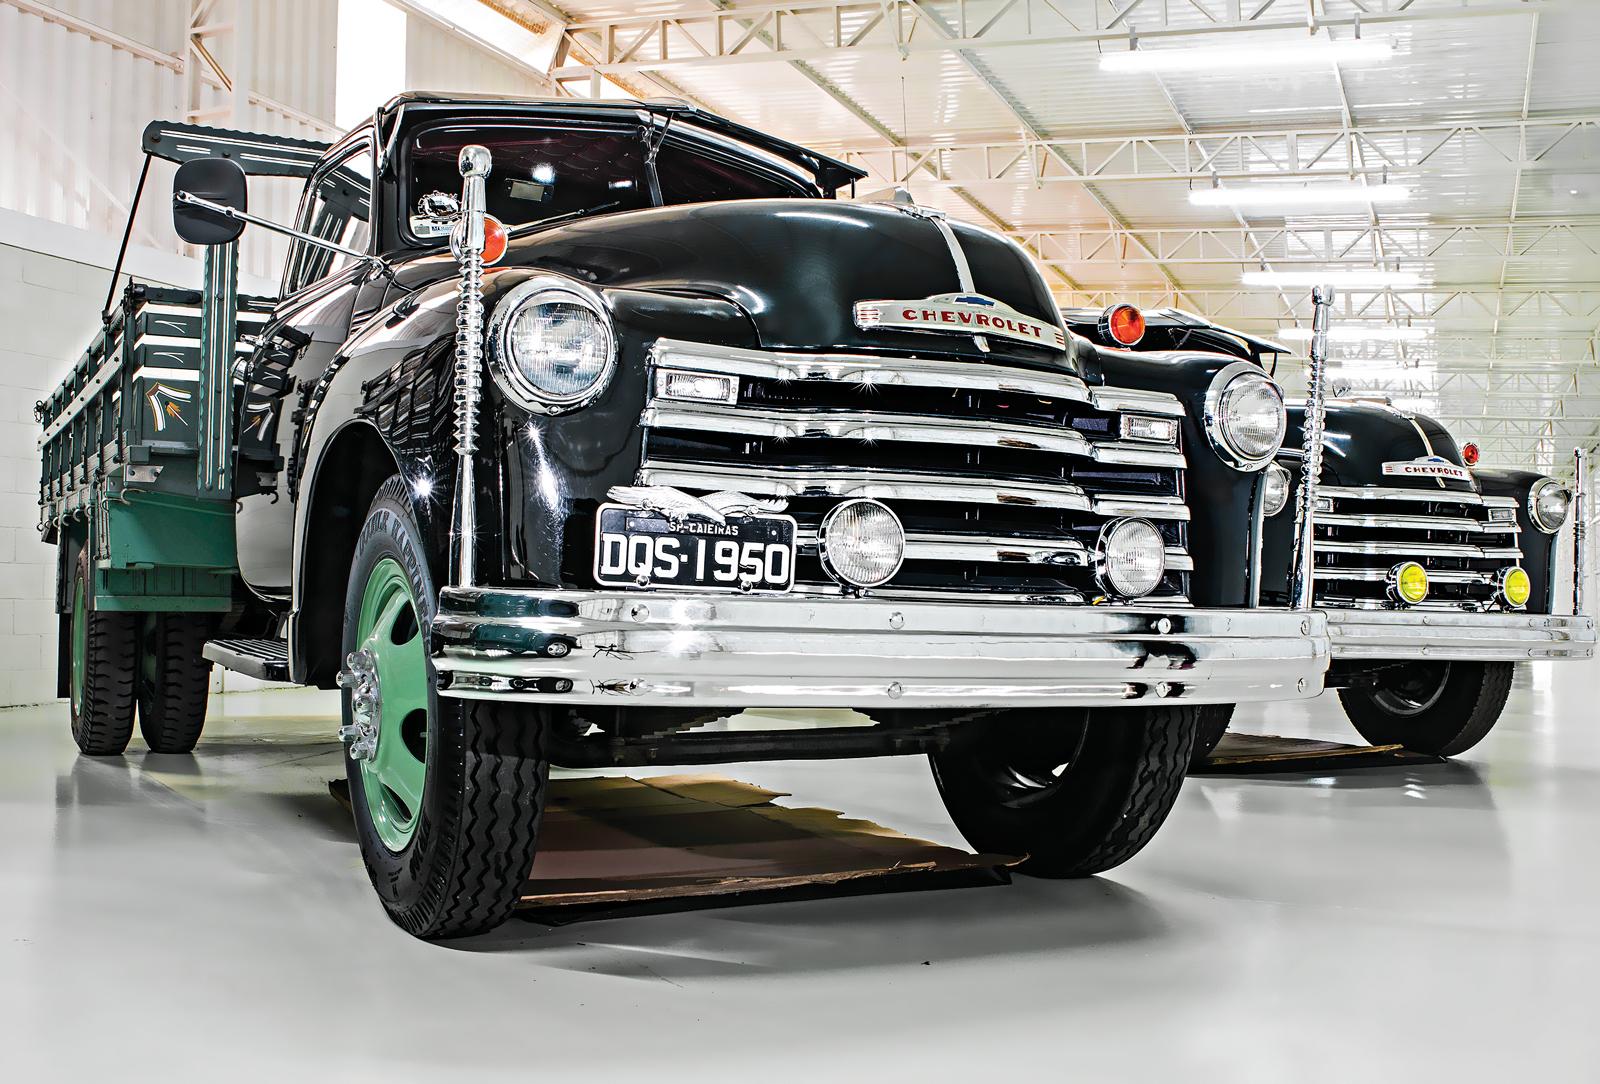 O modelo Chevrolet 1950, que foi do pai, está desde zero-km na família